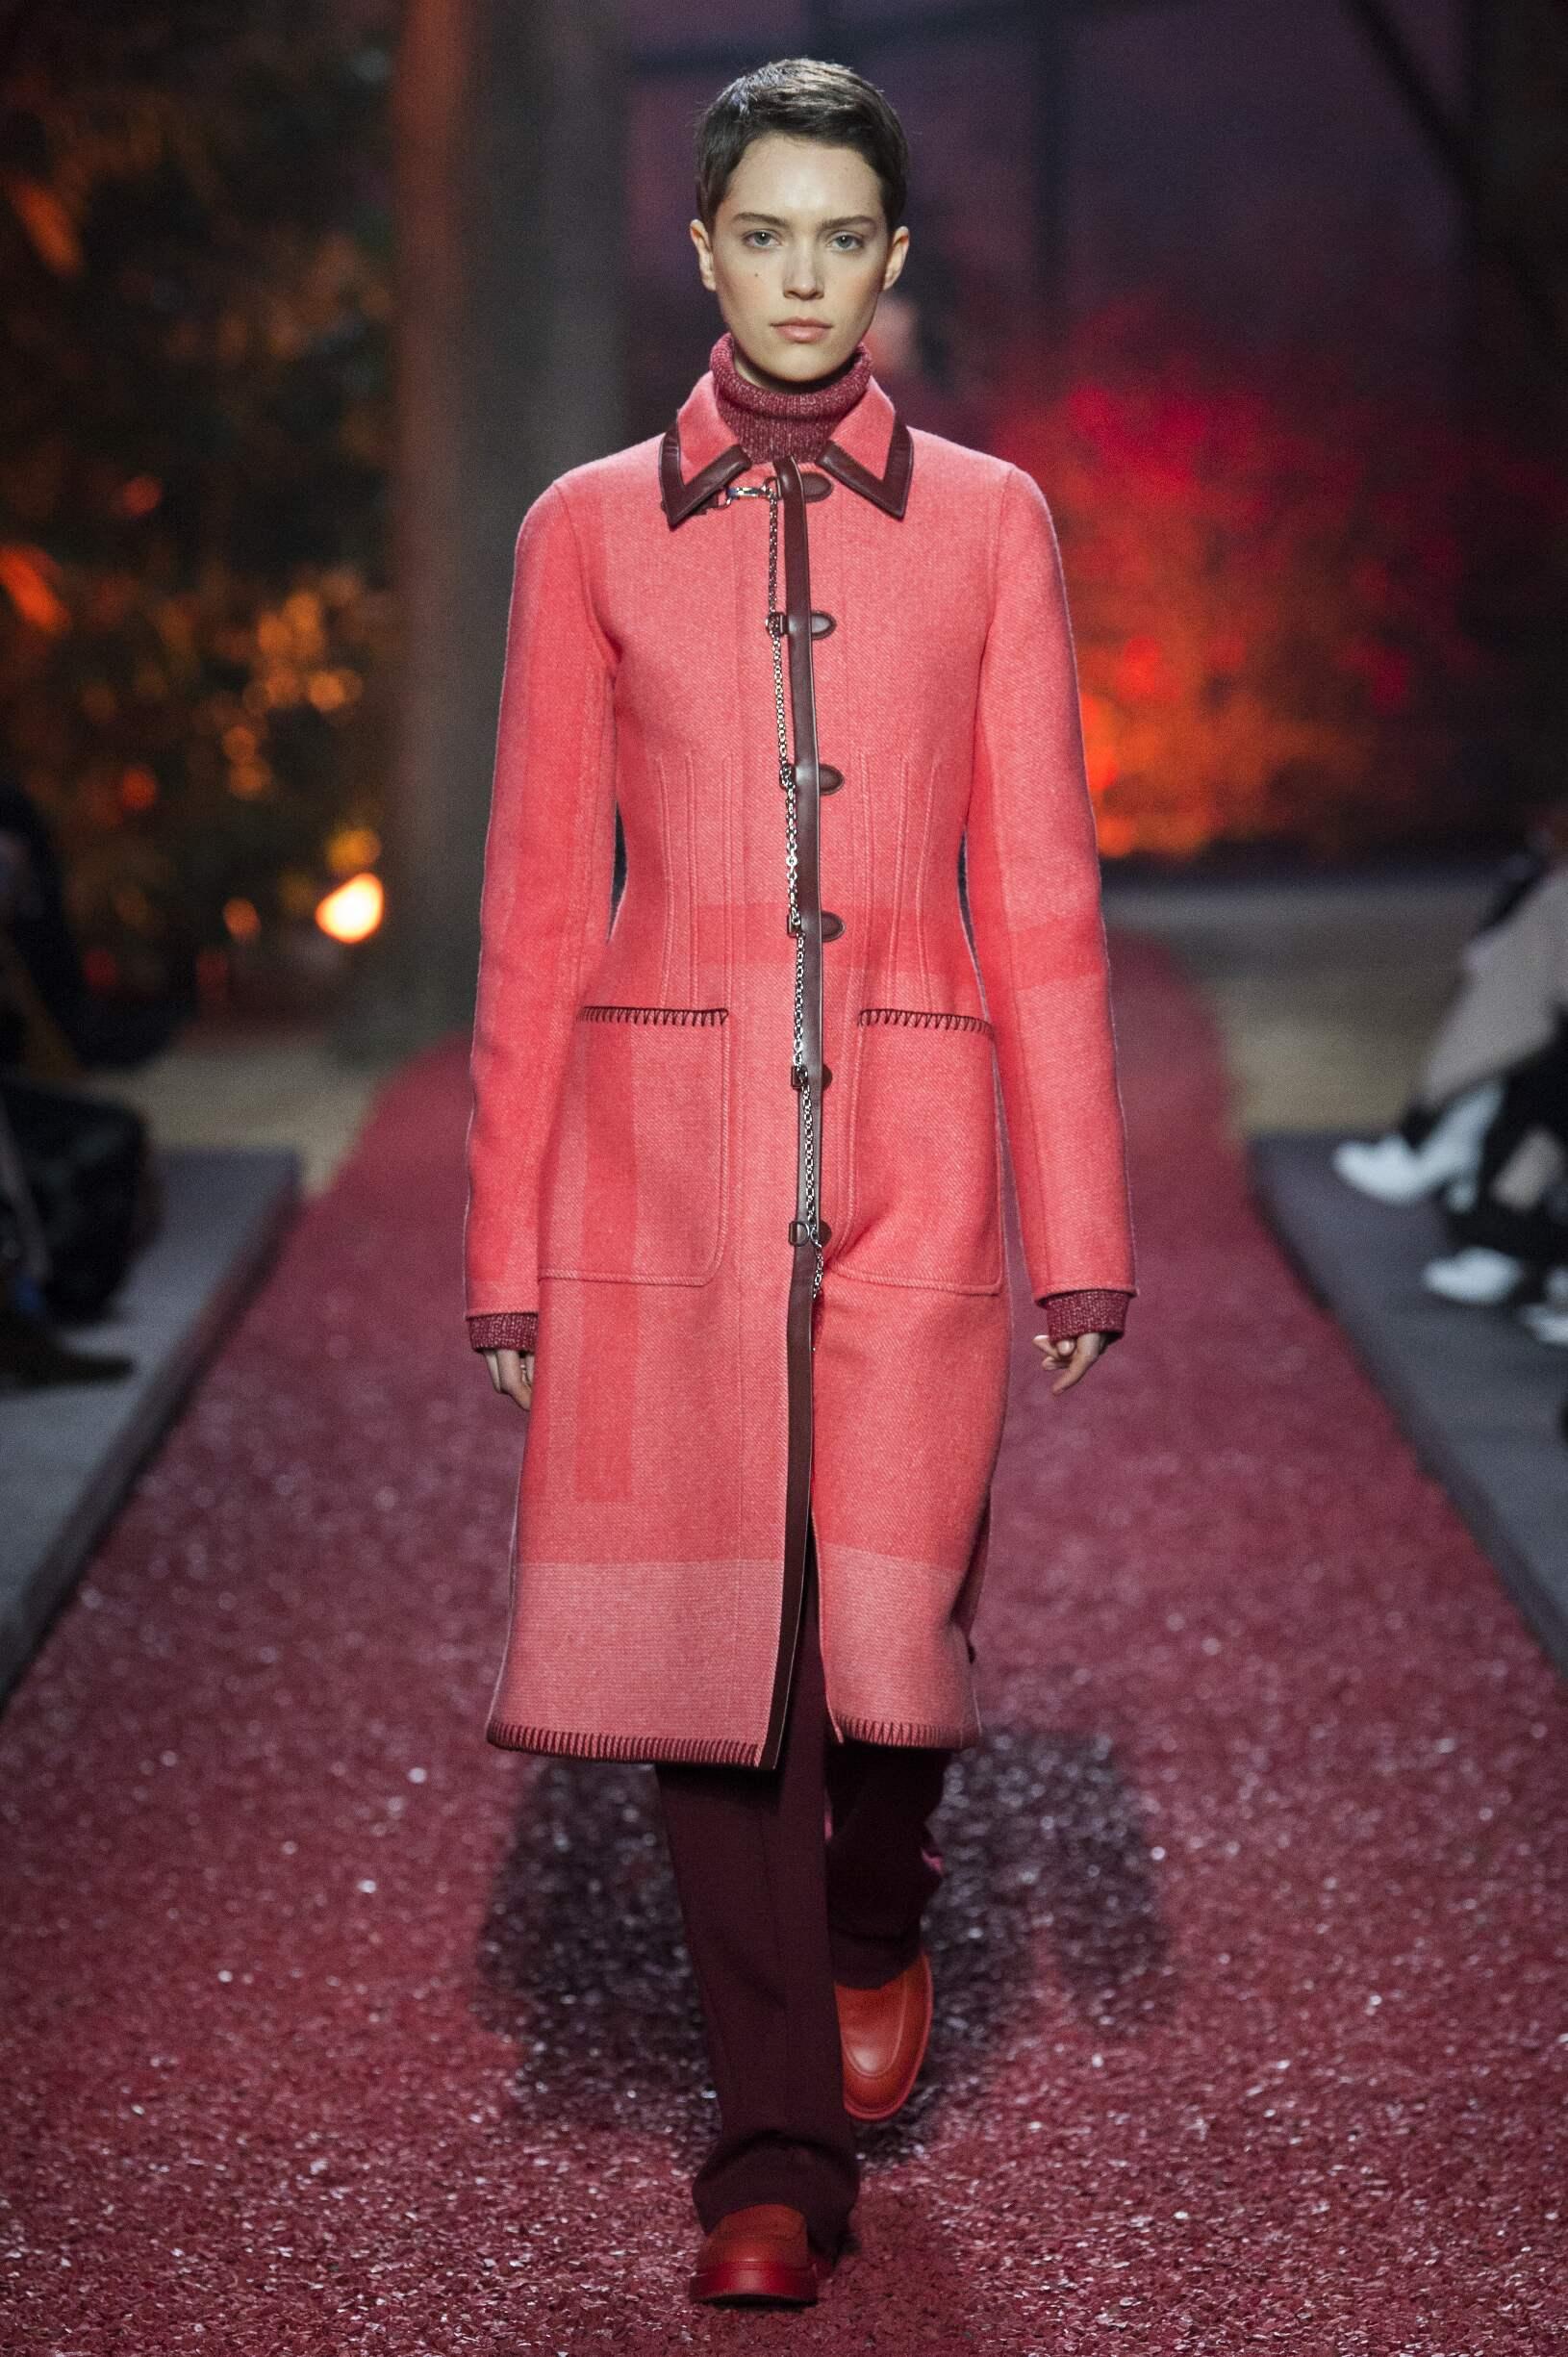 Model Catwalk Hermès